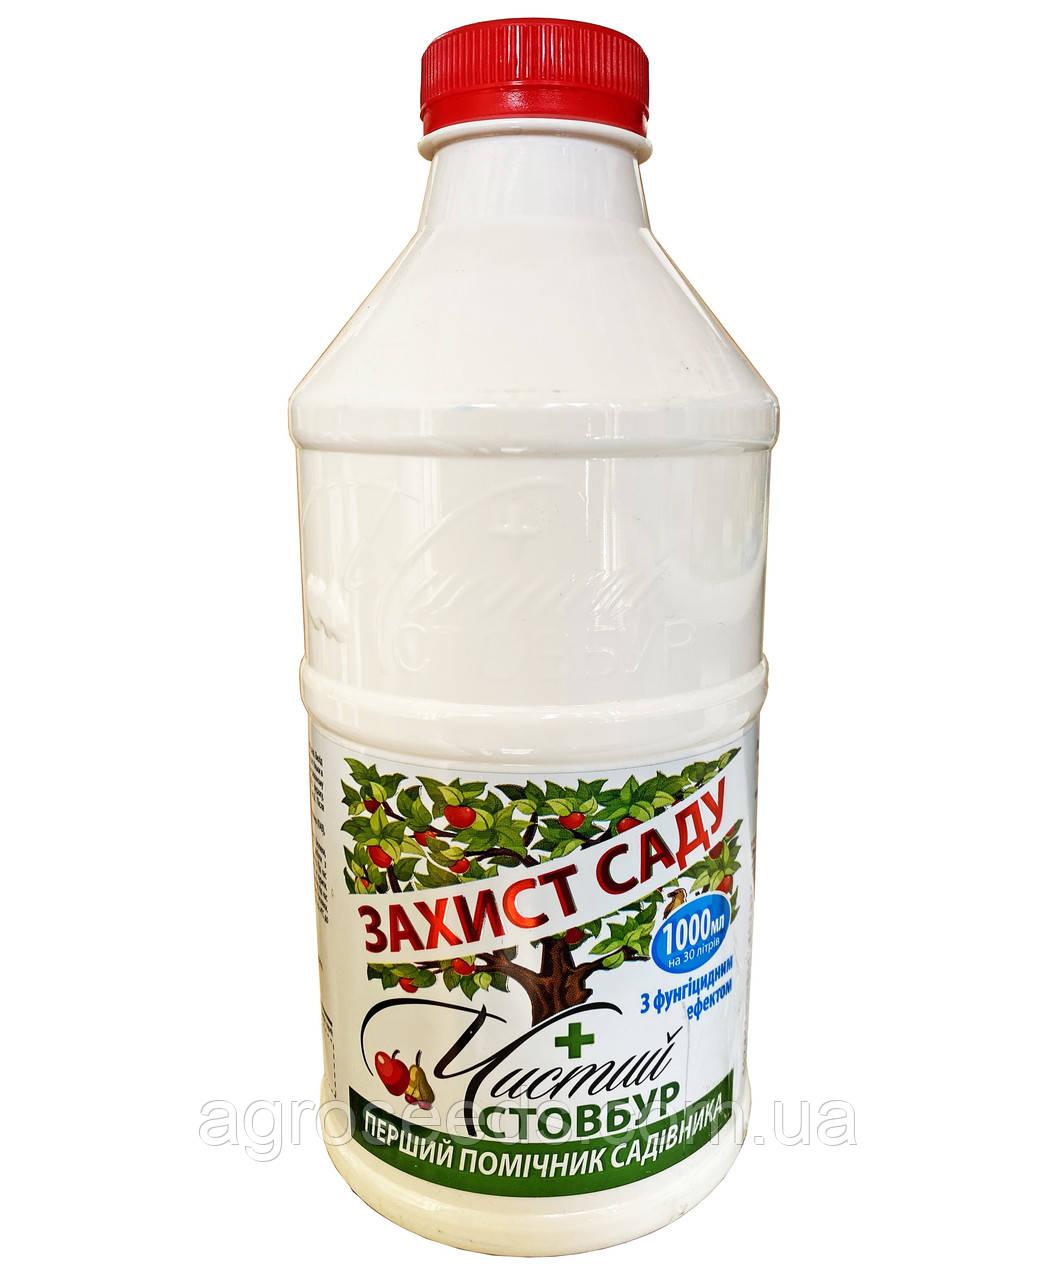 Инсектицид Чистый Ствол 1 л оригинал